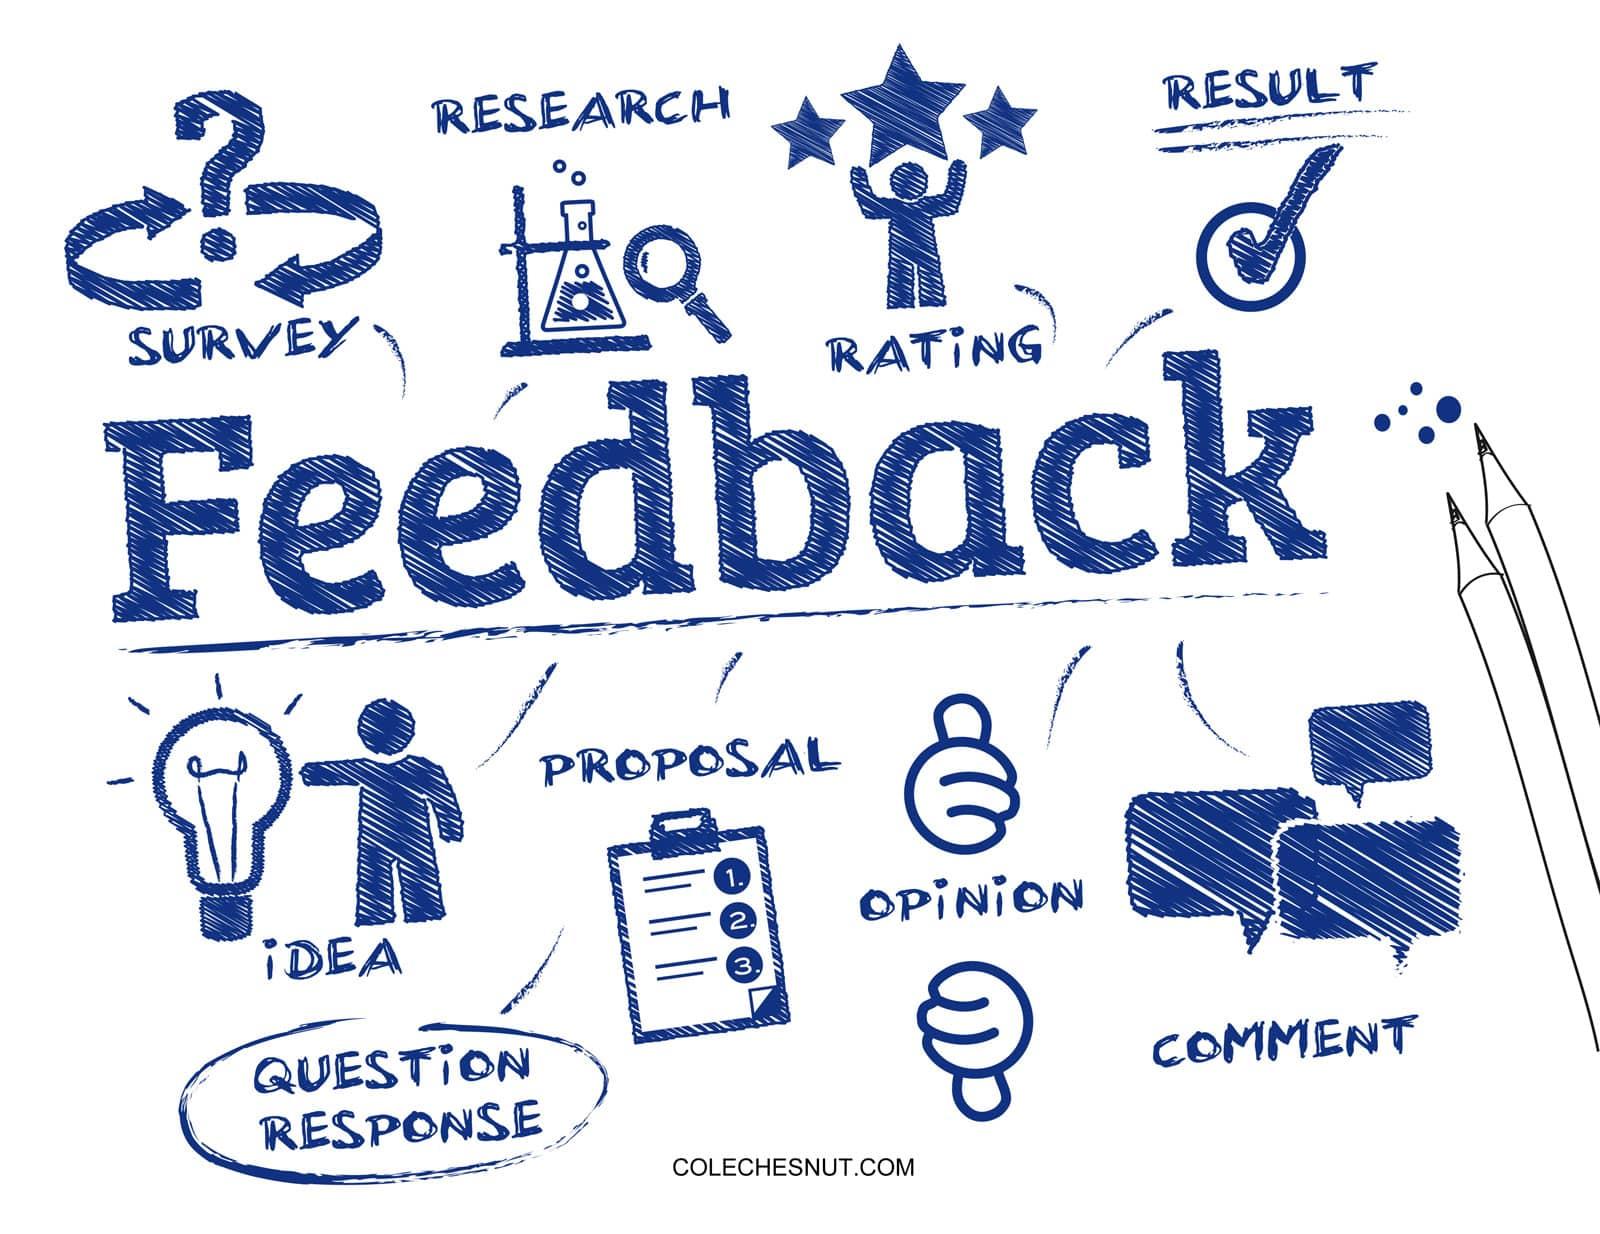 Blueprint for constructive feedback.